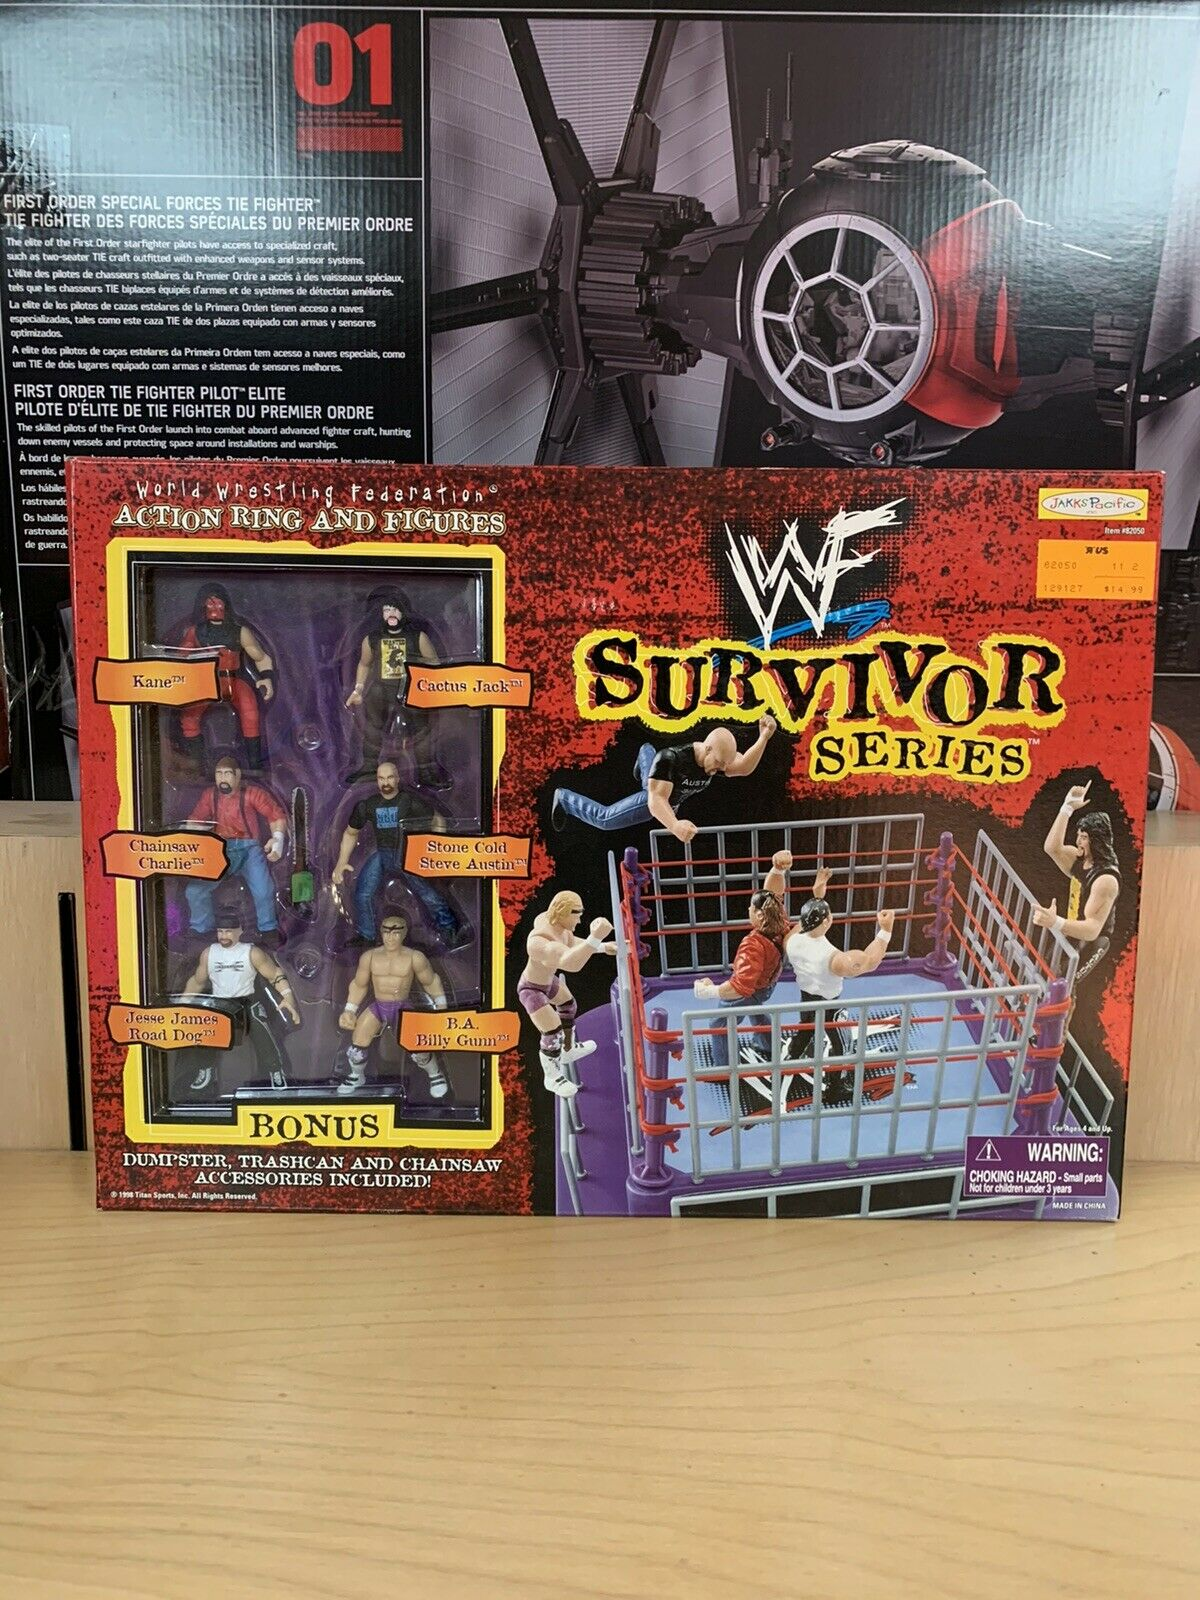 Jakks WWF WWE Action Ring Mini-Ring  Survivor Series (Near Mint)